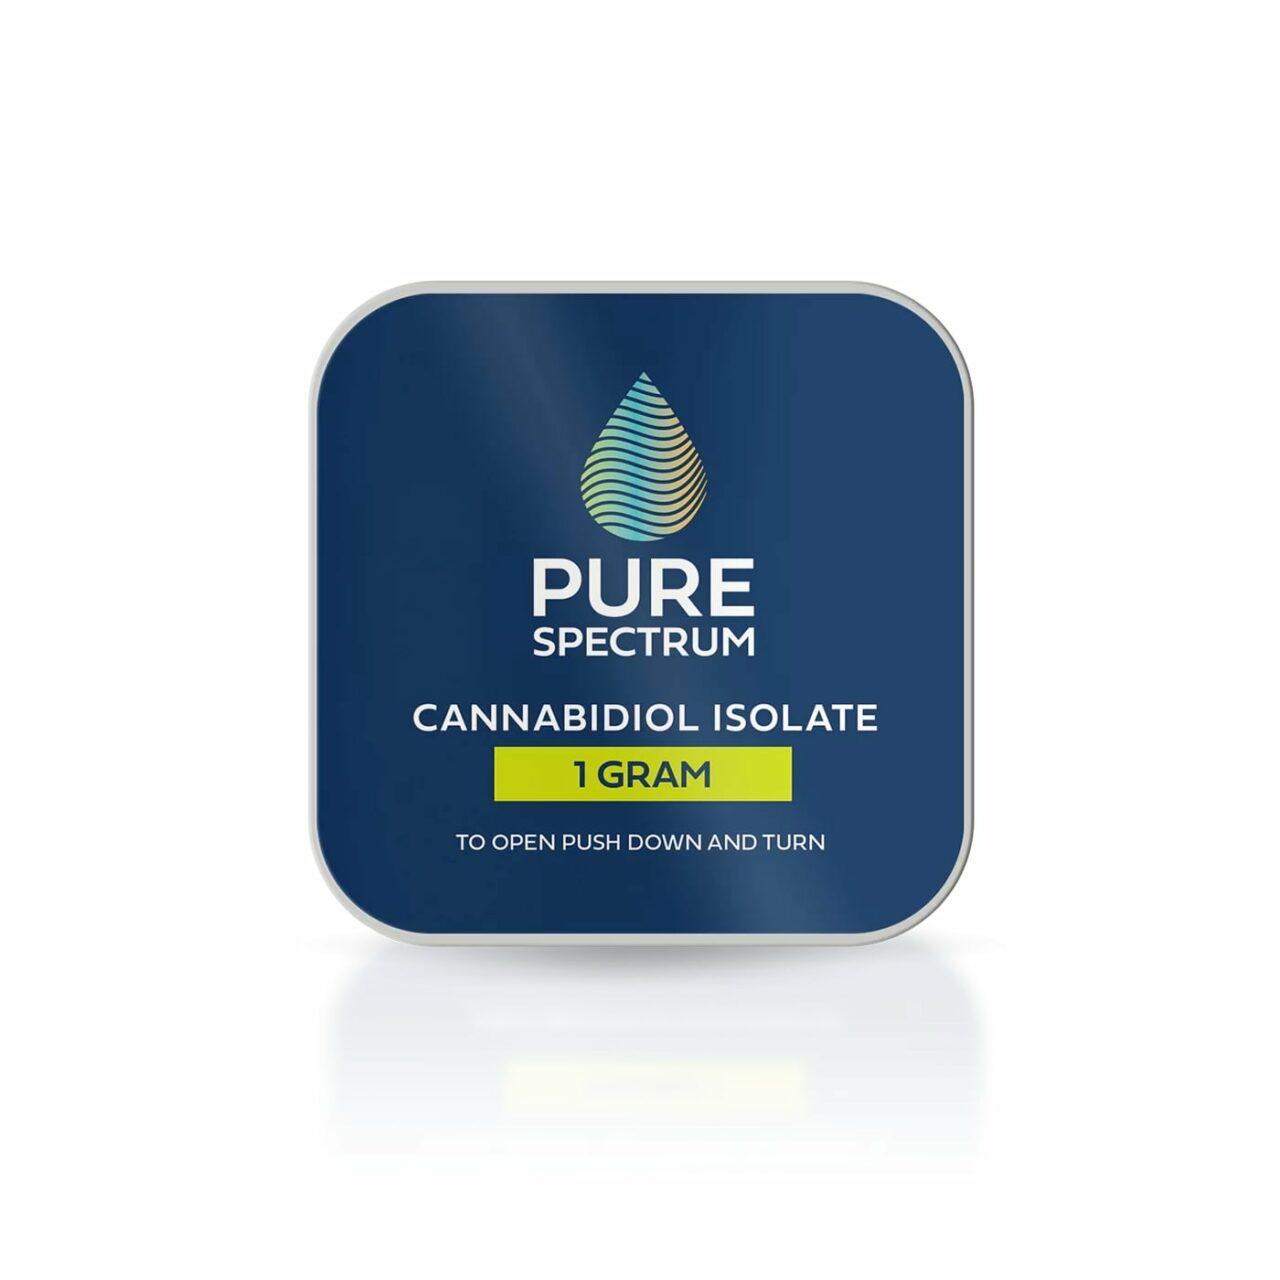 Pure Spectrum, 99% CBD Isolate Powder, 1g, 1000mg of CBD